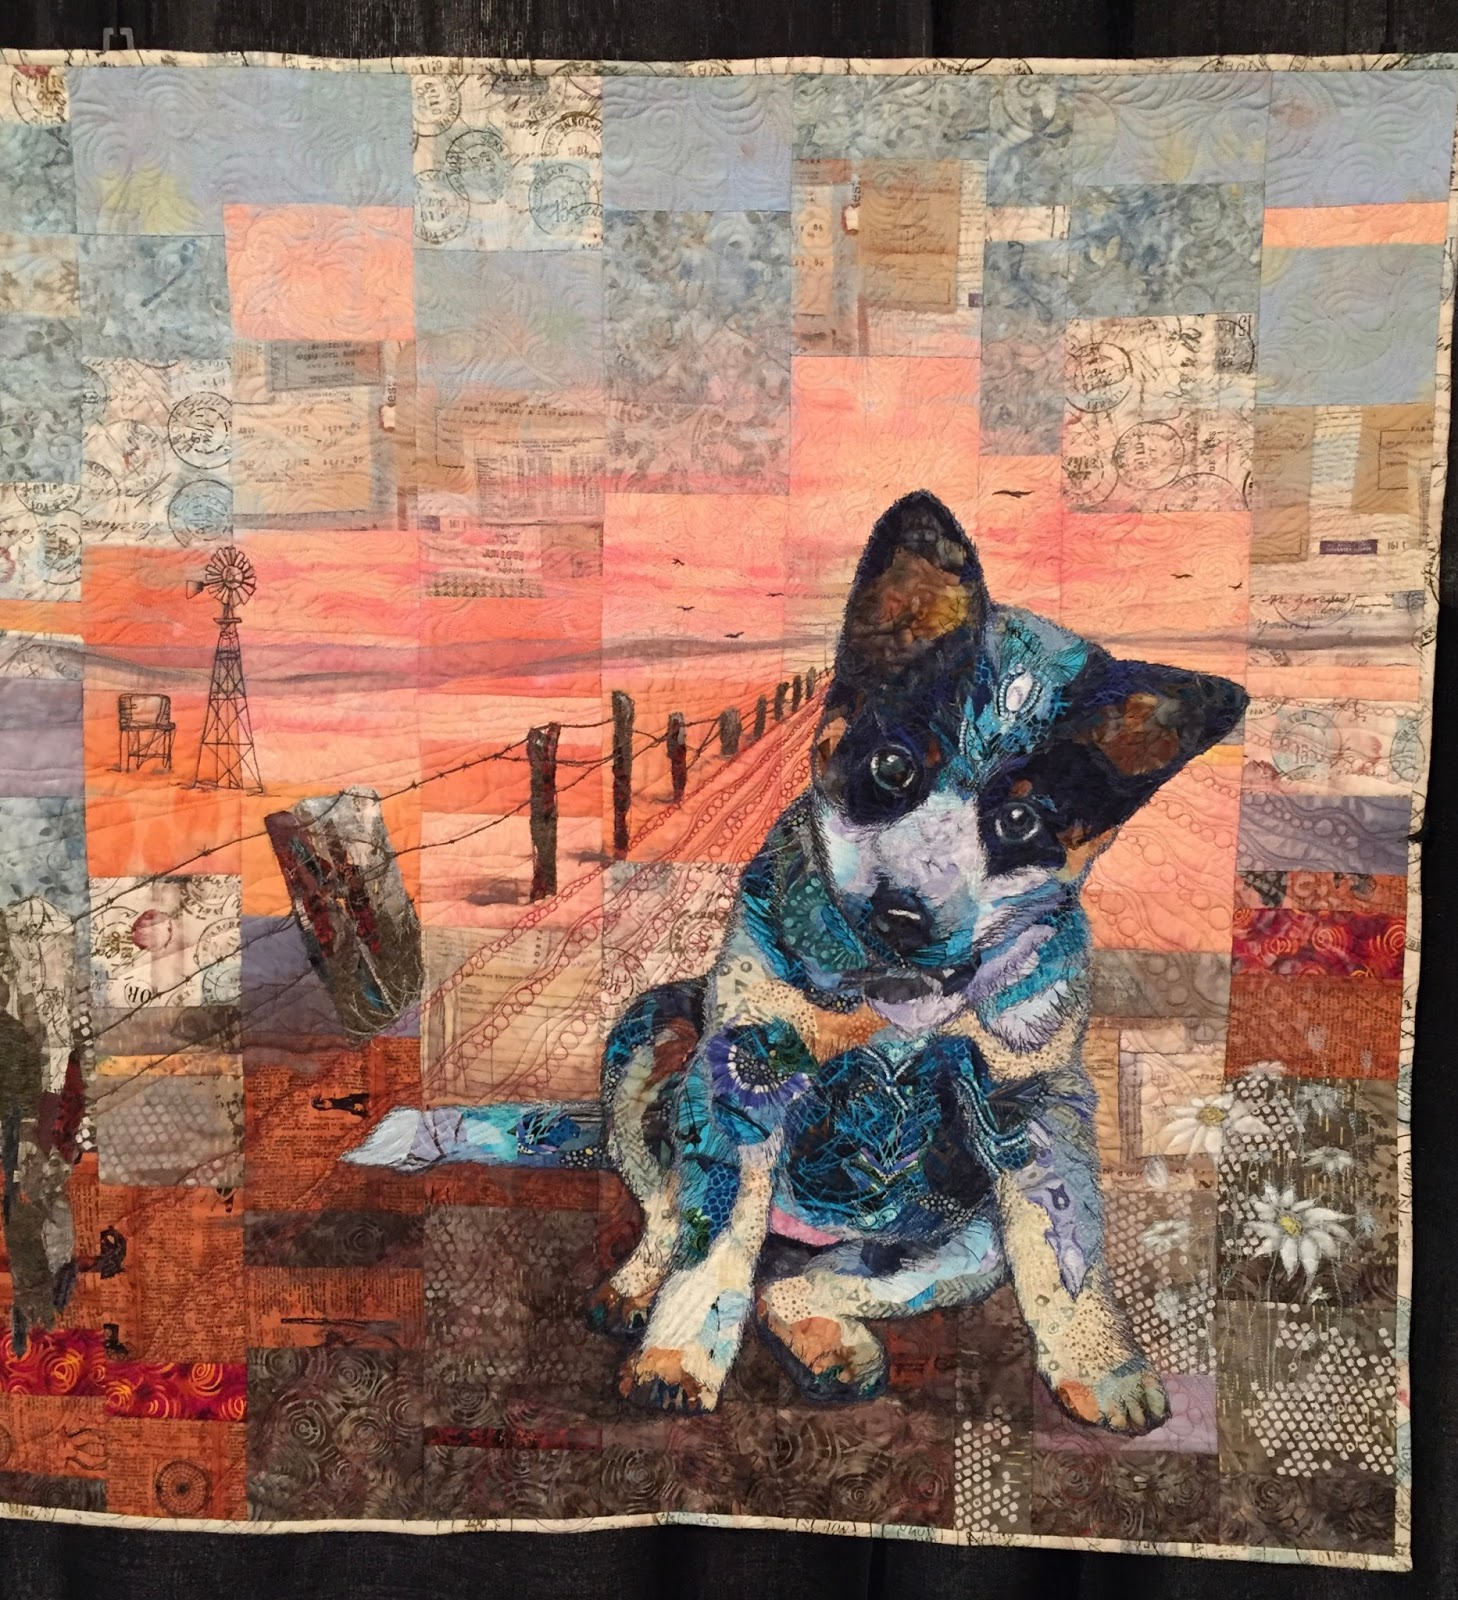 Sew Fun 2 Quilt: Art Pictorial Quilts : pictorial quilt artists - Adamdwight.com